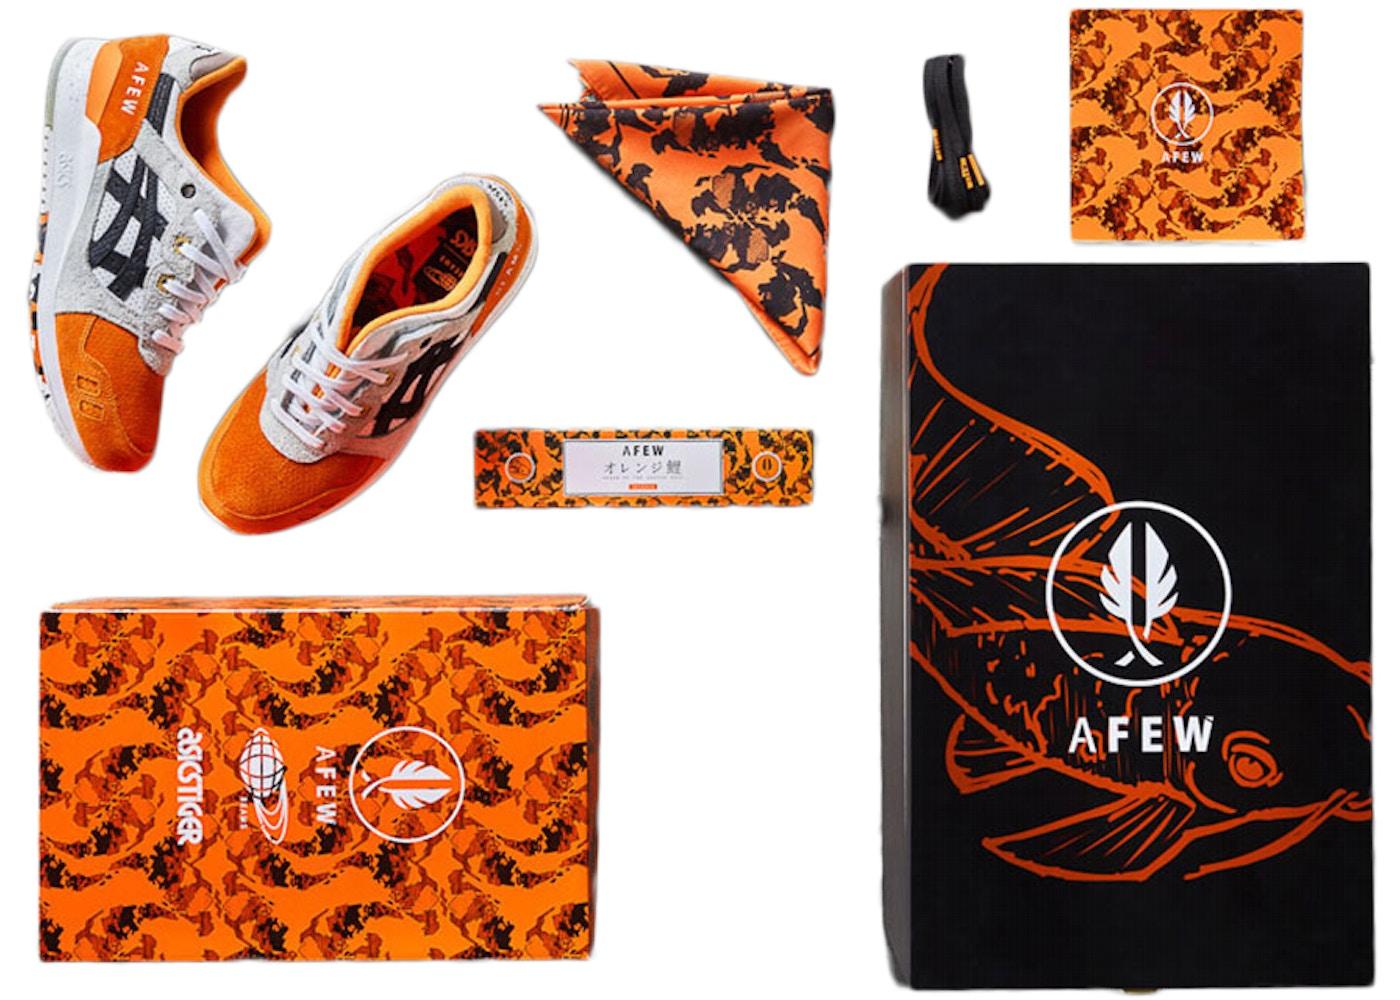 separation shoes c035f 0c85a Asics Gel-Lyte III Afew x Beams Orange Koi (Special Box)